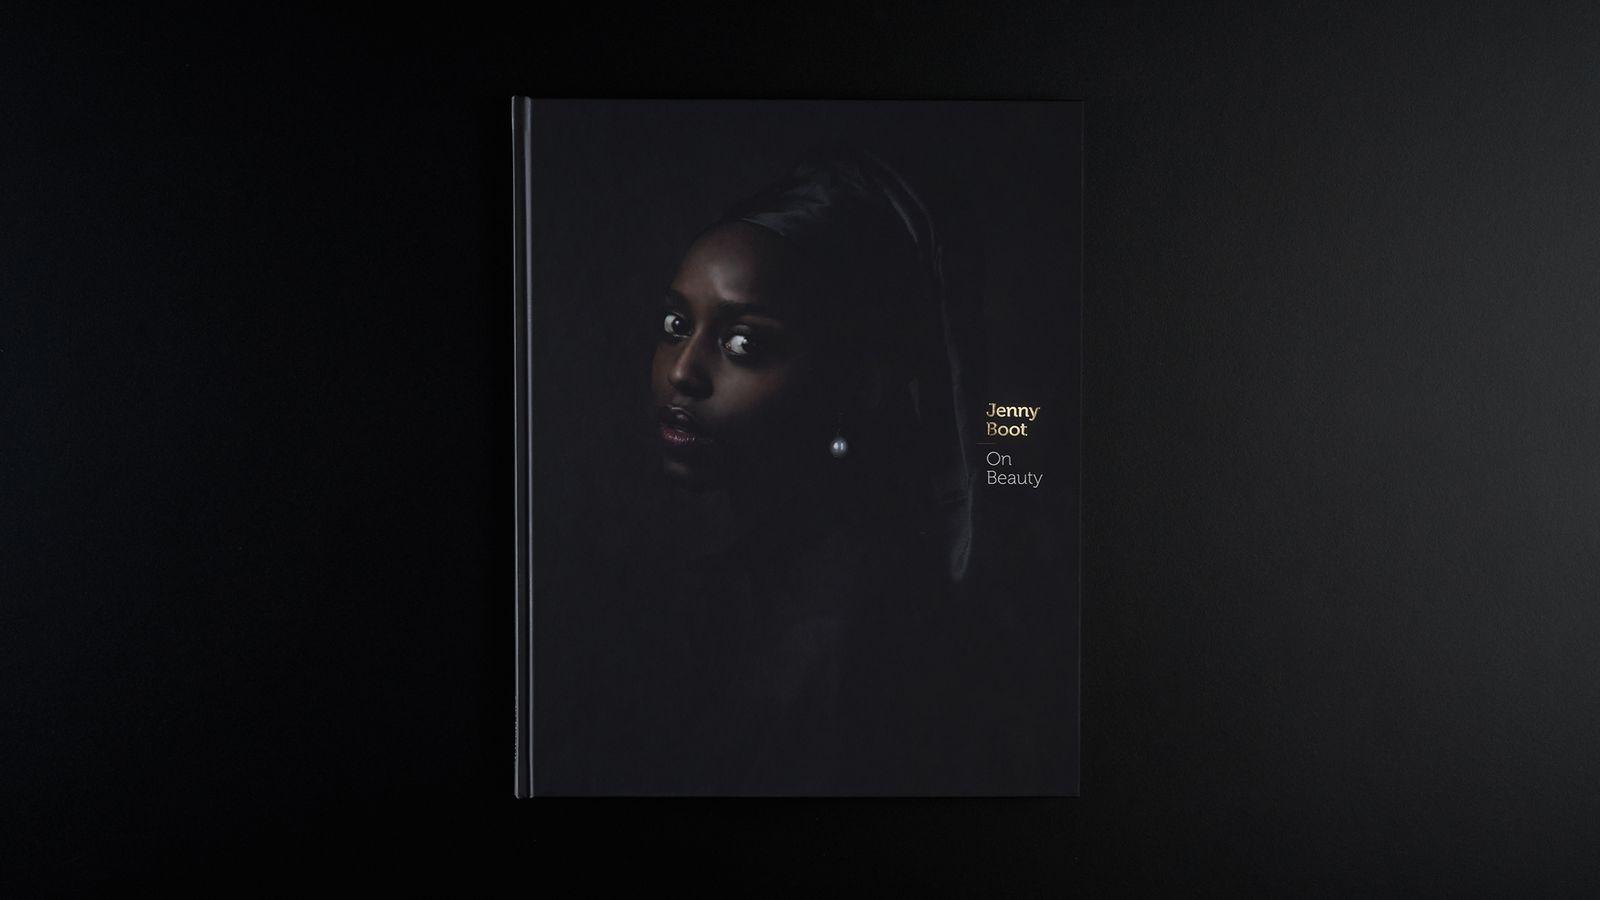 On beauty - Cover.jpg